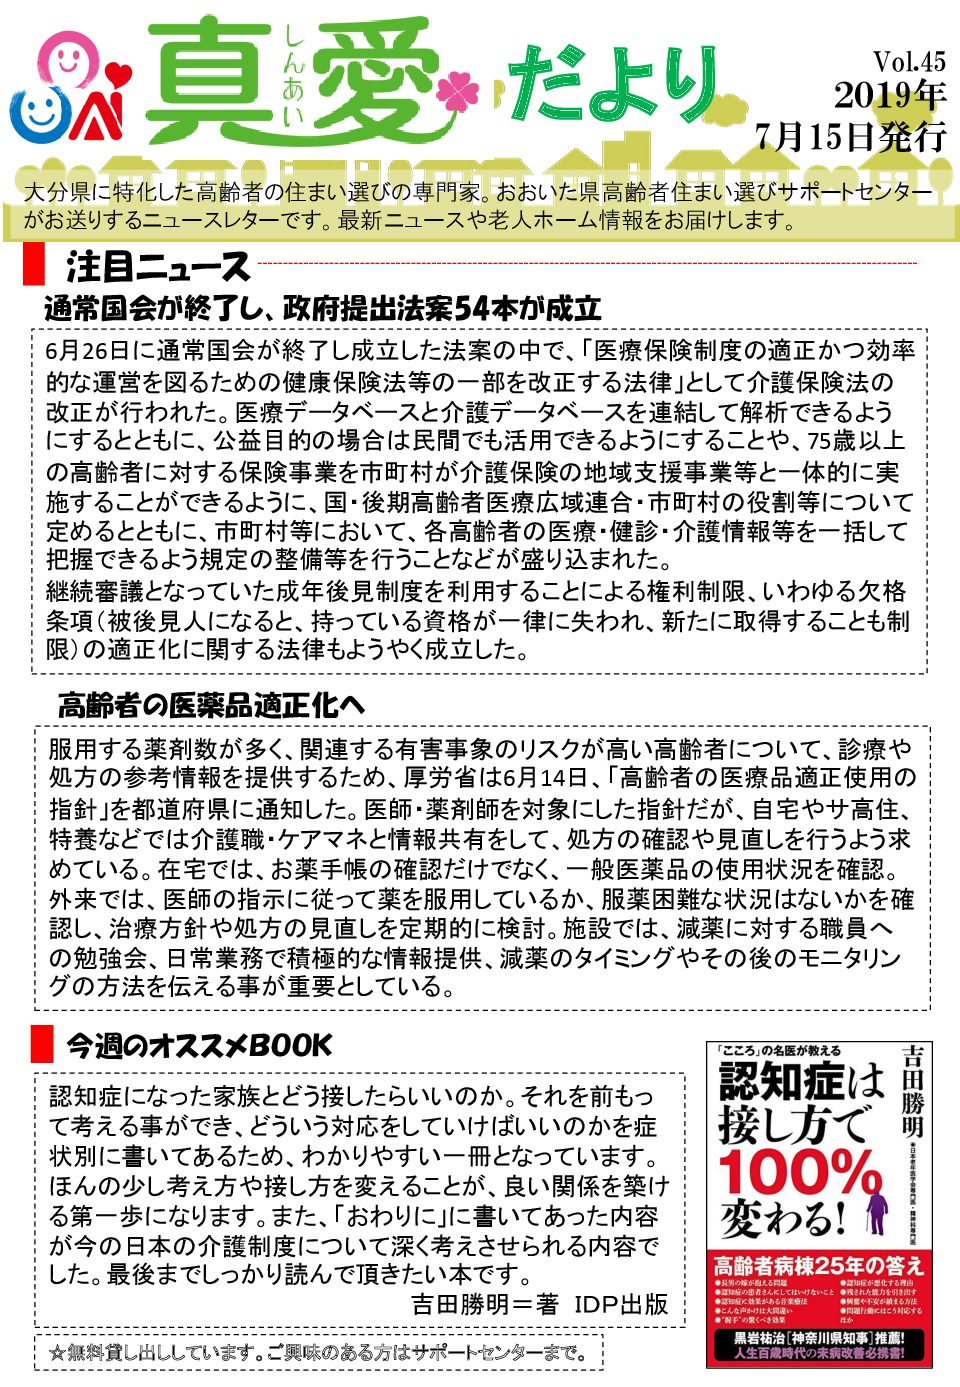 【Vol.45】 2019.07.15発行